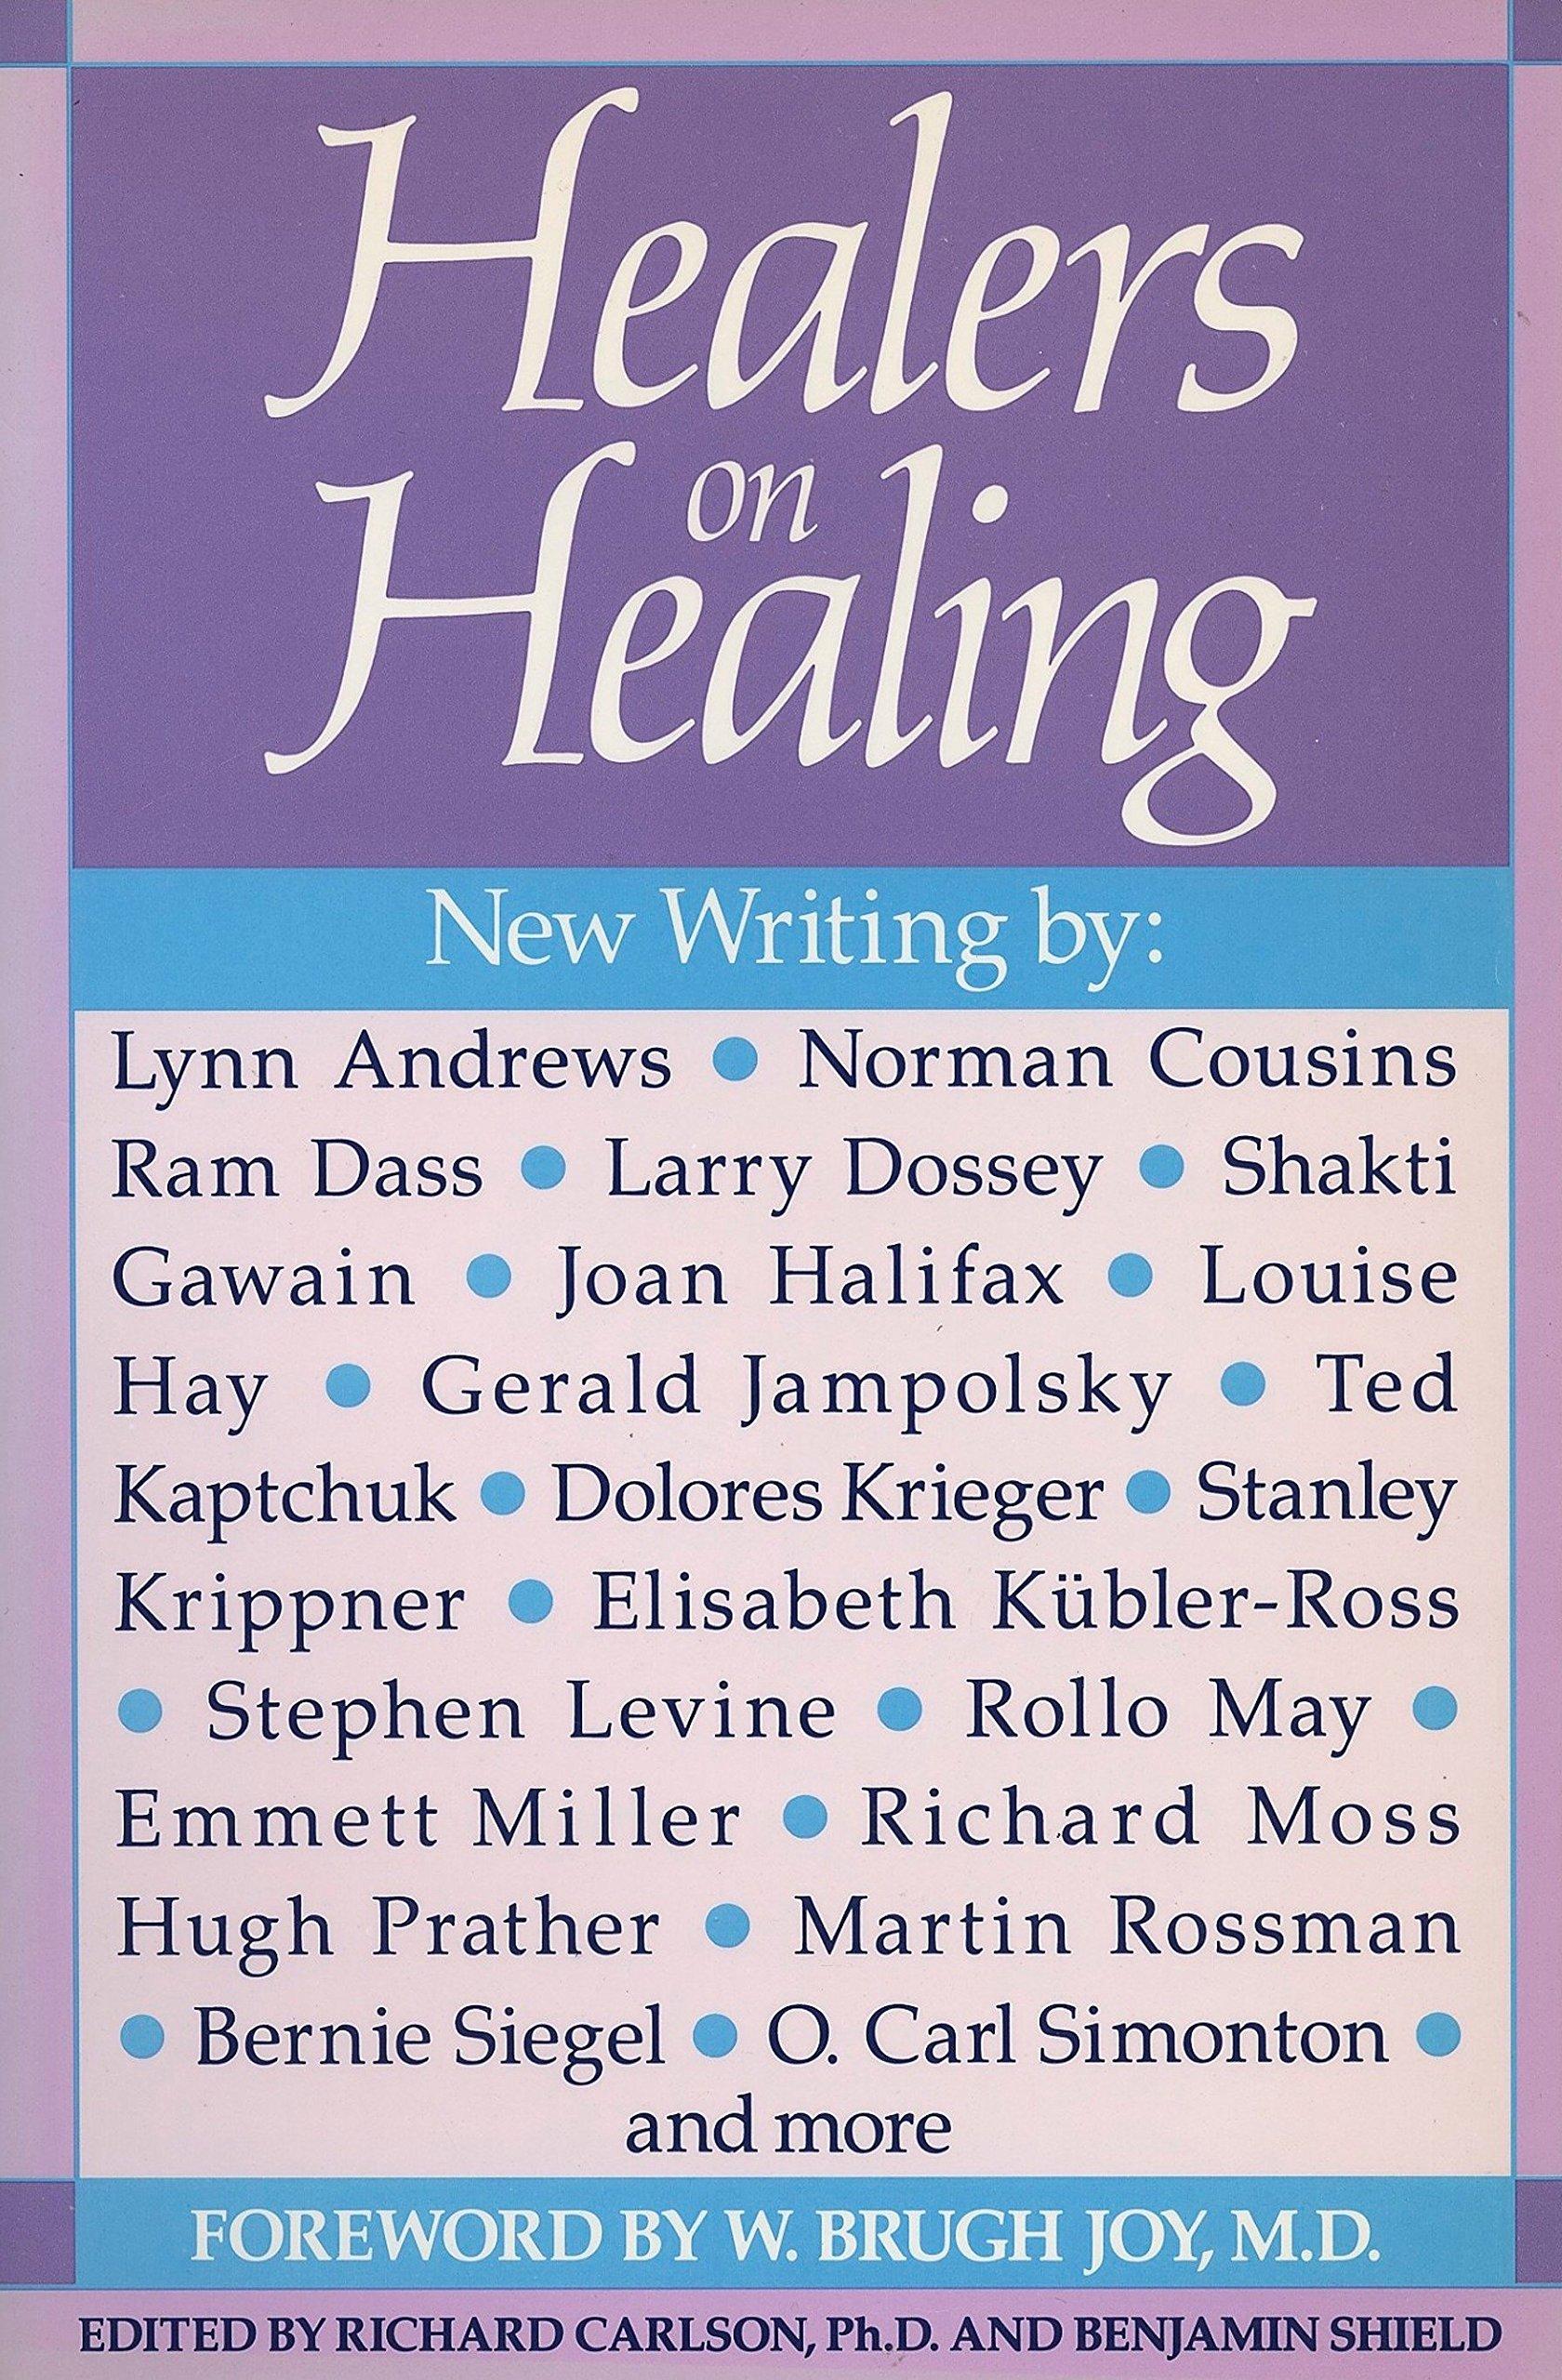 Healers on Healing: Richard Carlson: 9780874774948: Books - Amazon.ca